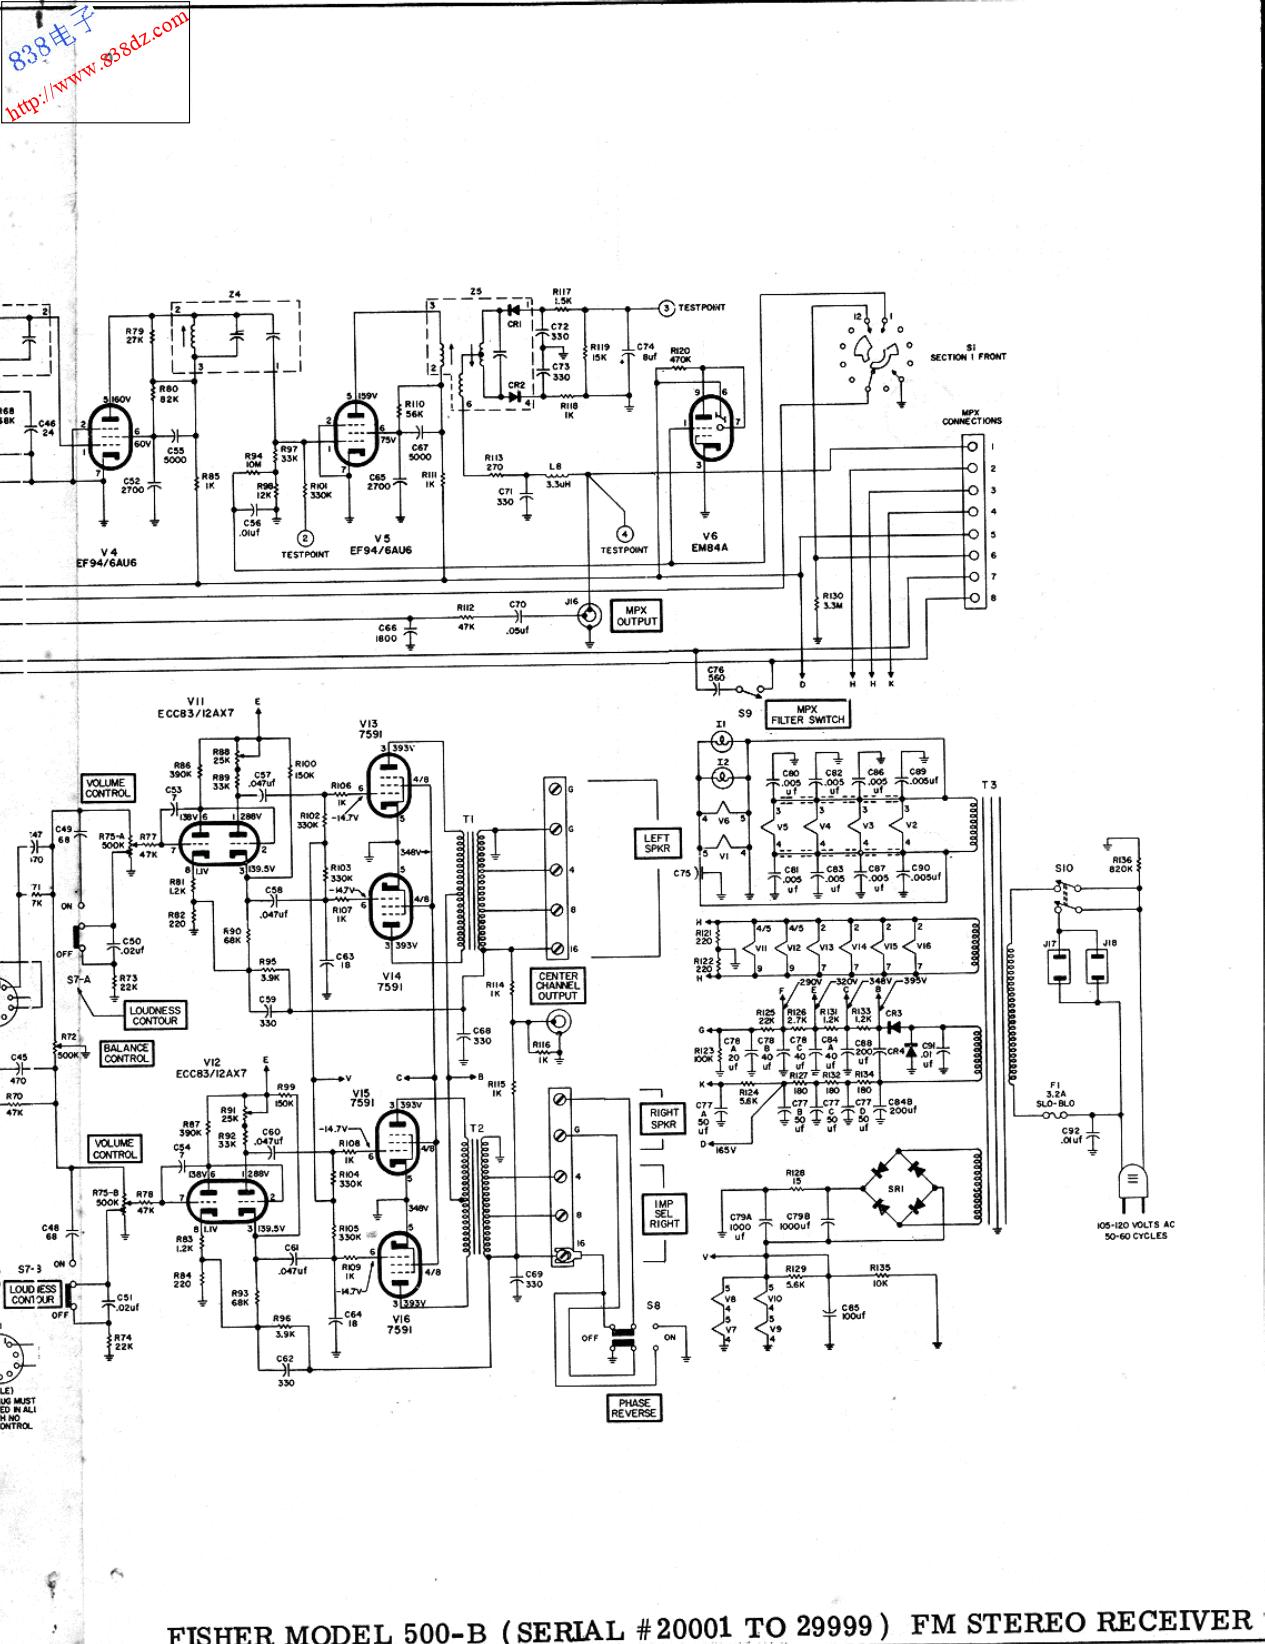 FISHER飞燕500-B胆收扩音机电路图